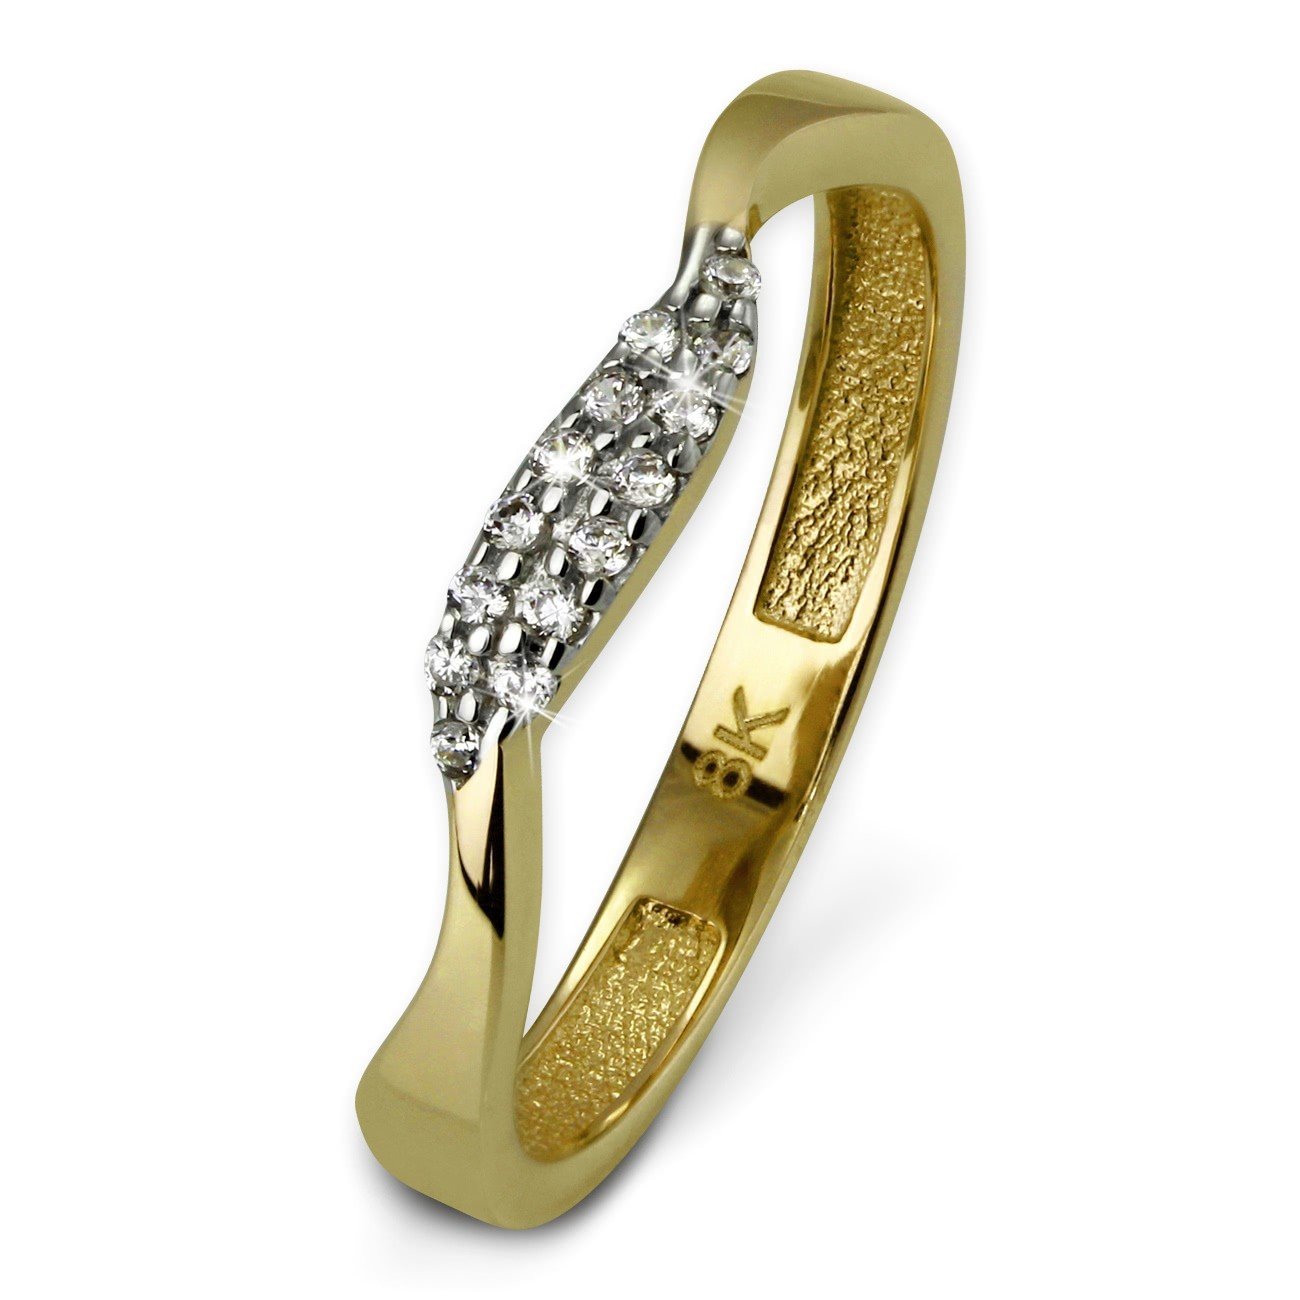 GoldDream Gold Ring Welle Zirkonia weiß Gr.60 333er Gelbgold GDR501Y60